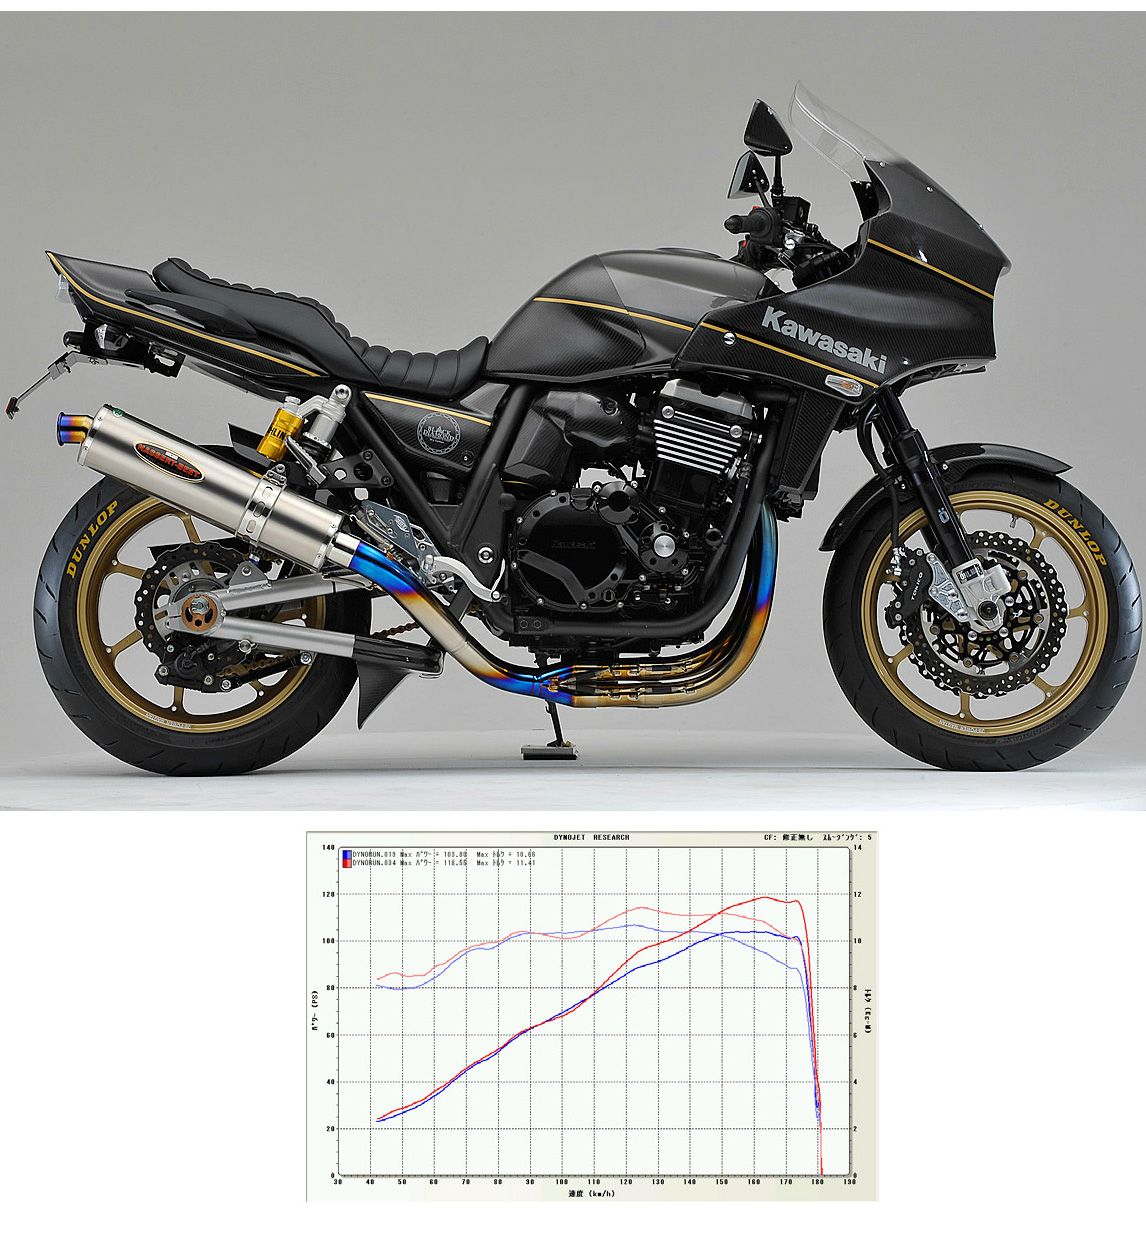 【BEET】NASSERT-3D標準型全段排氣管  - 「Webike-摩托百貨」